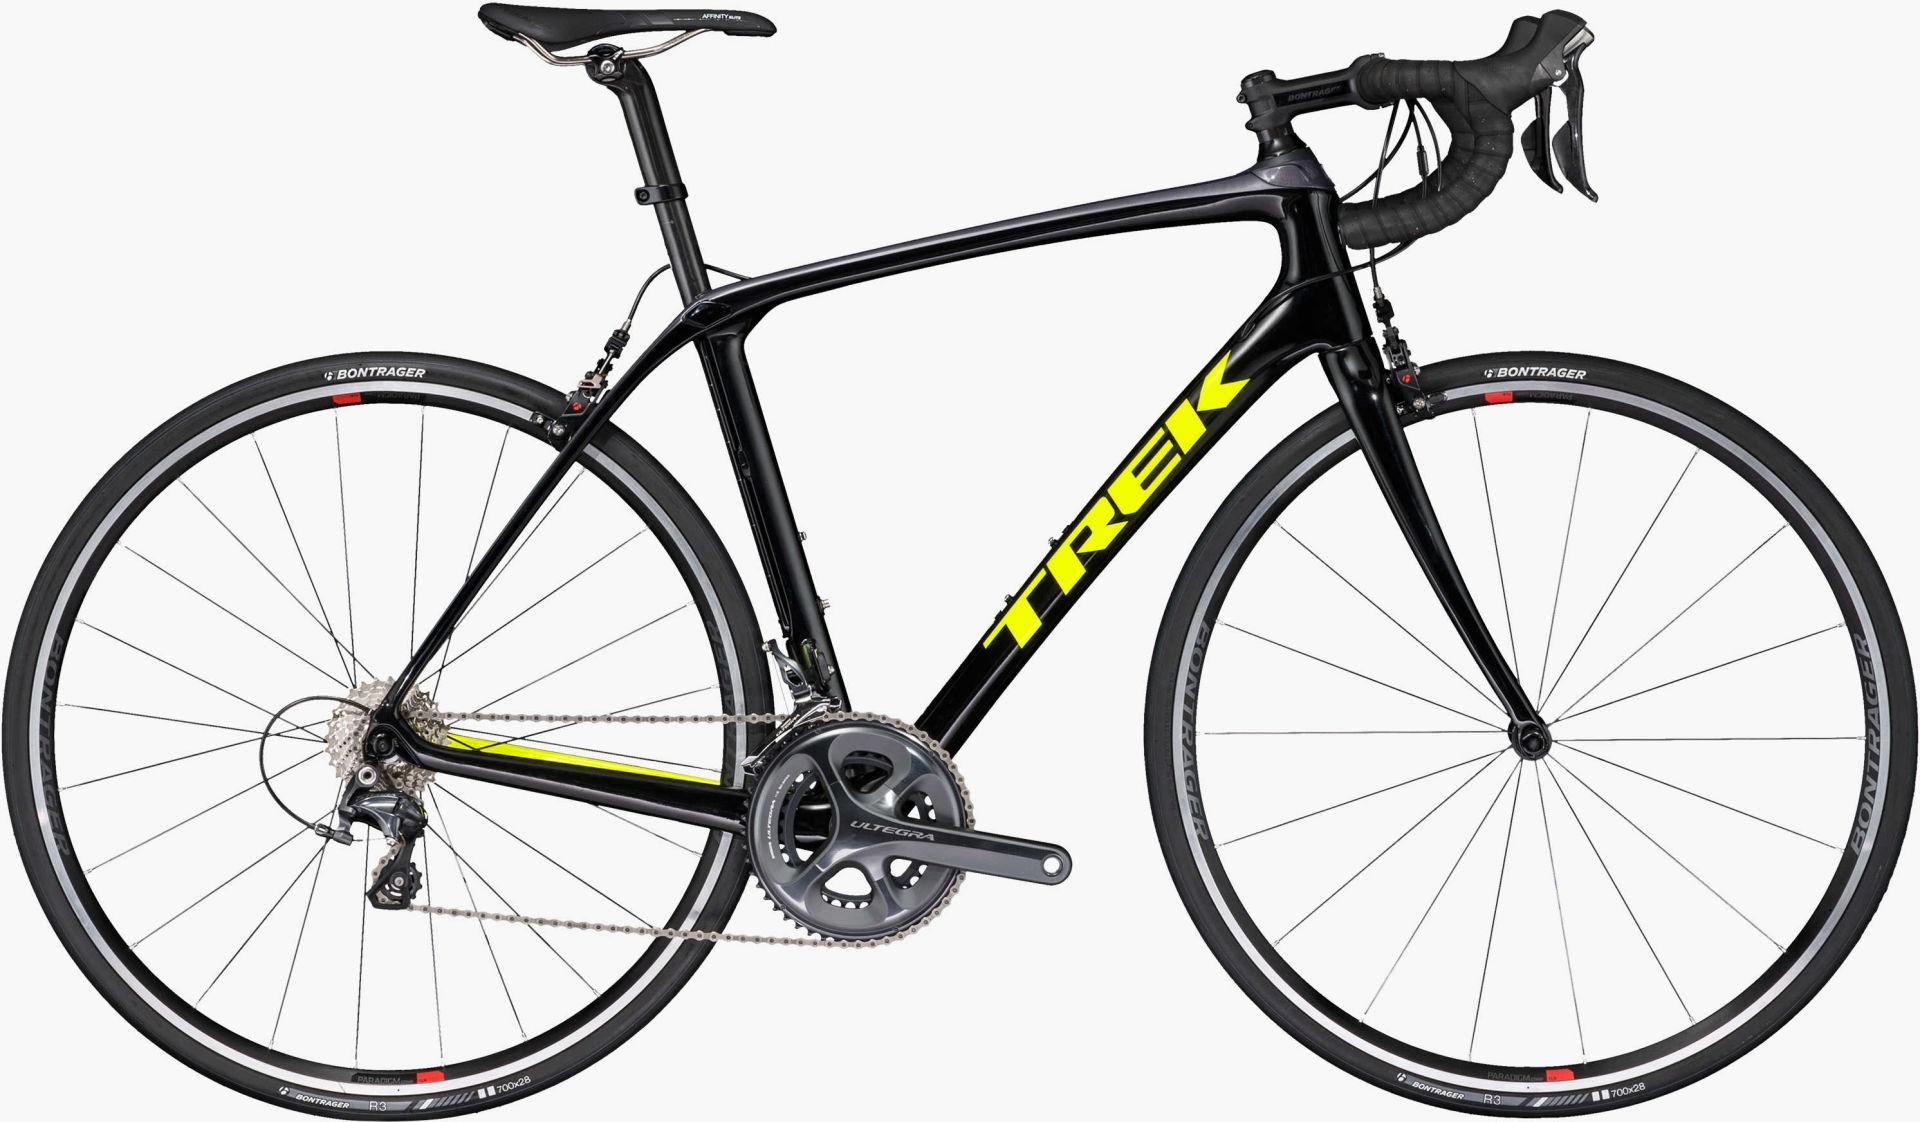 Trek Domane Slr 6 2017 Racing Bike